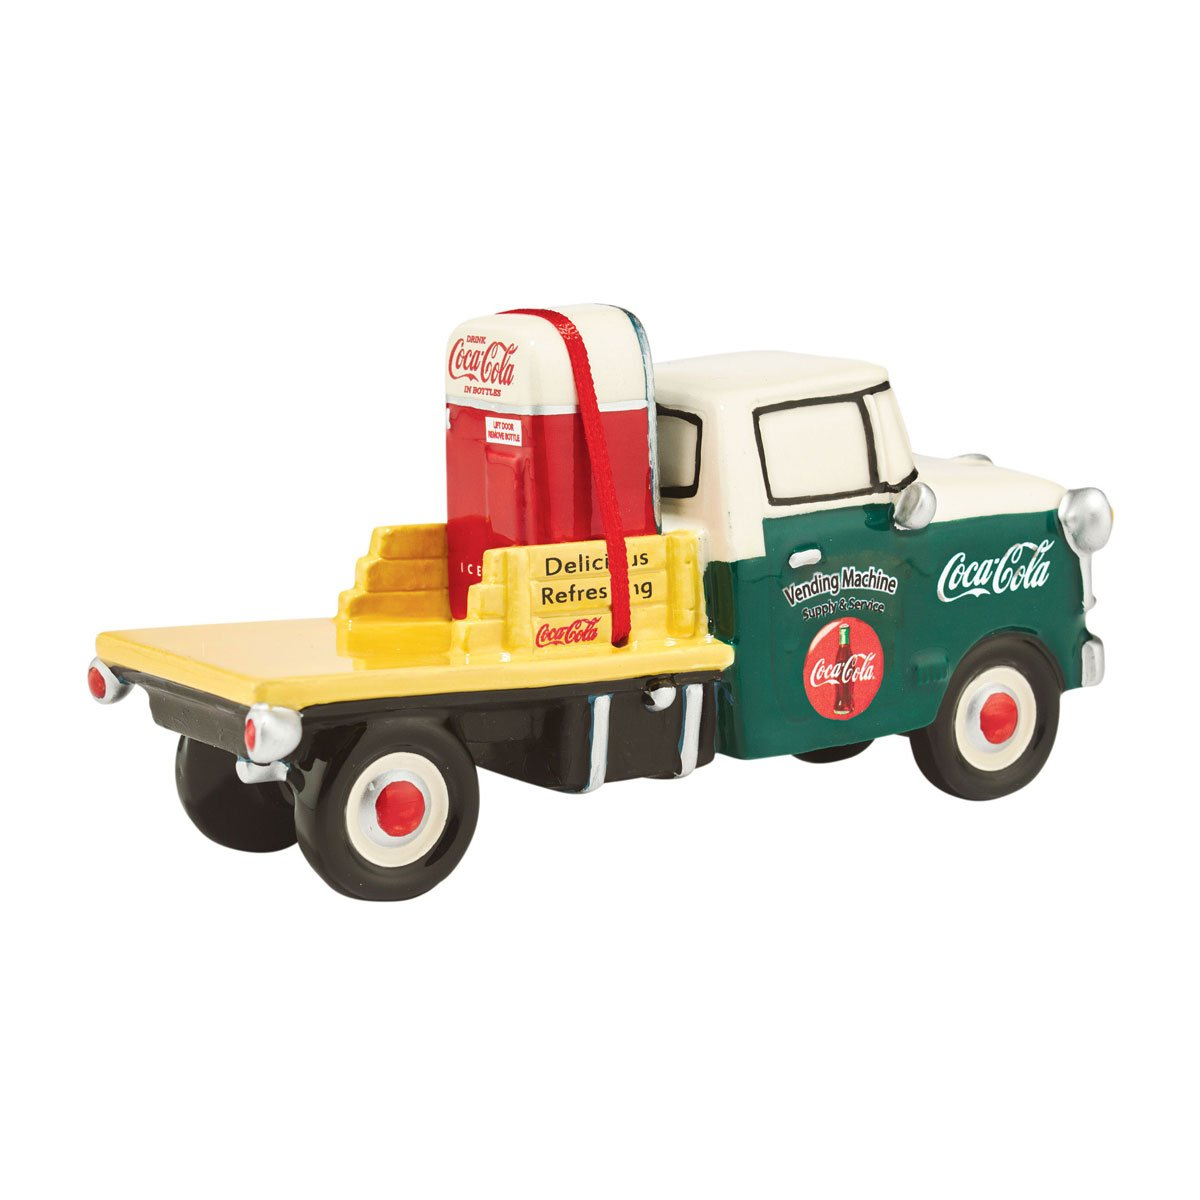 Department 56 Original Snow Village Coca-Cola Service Truck